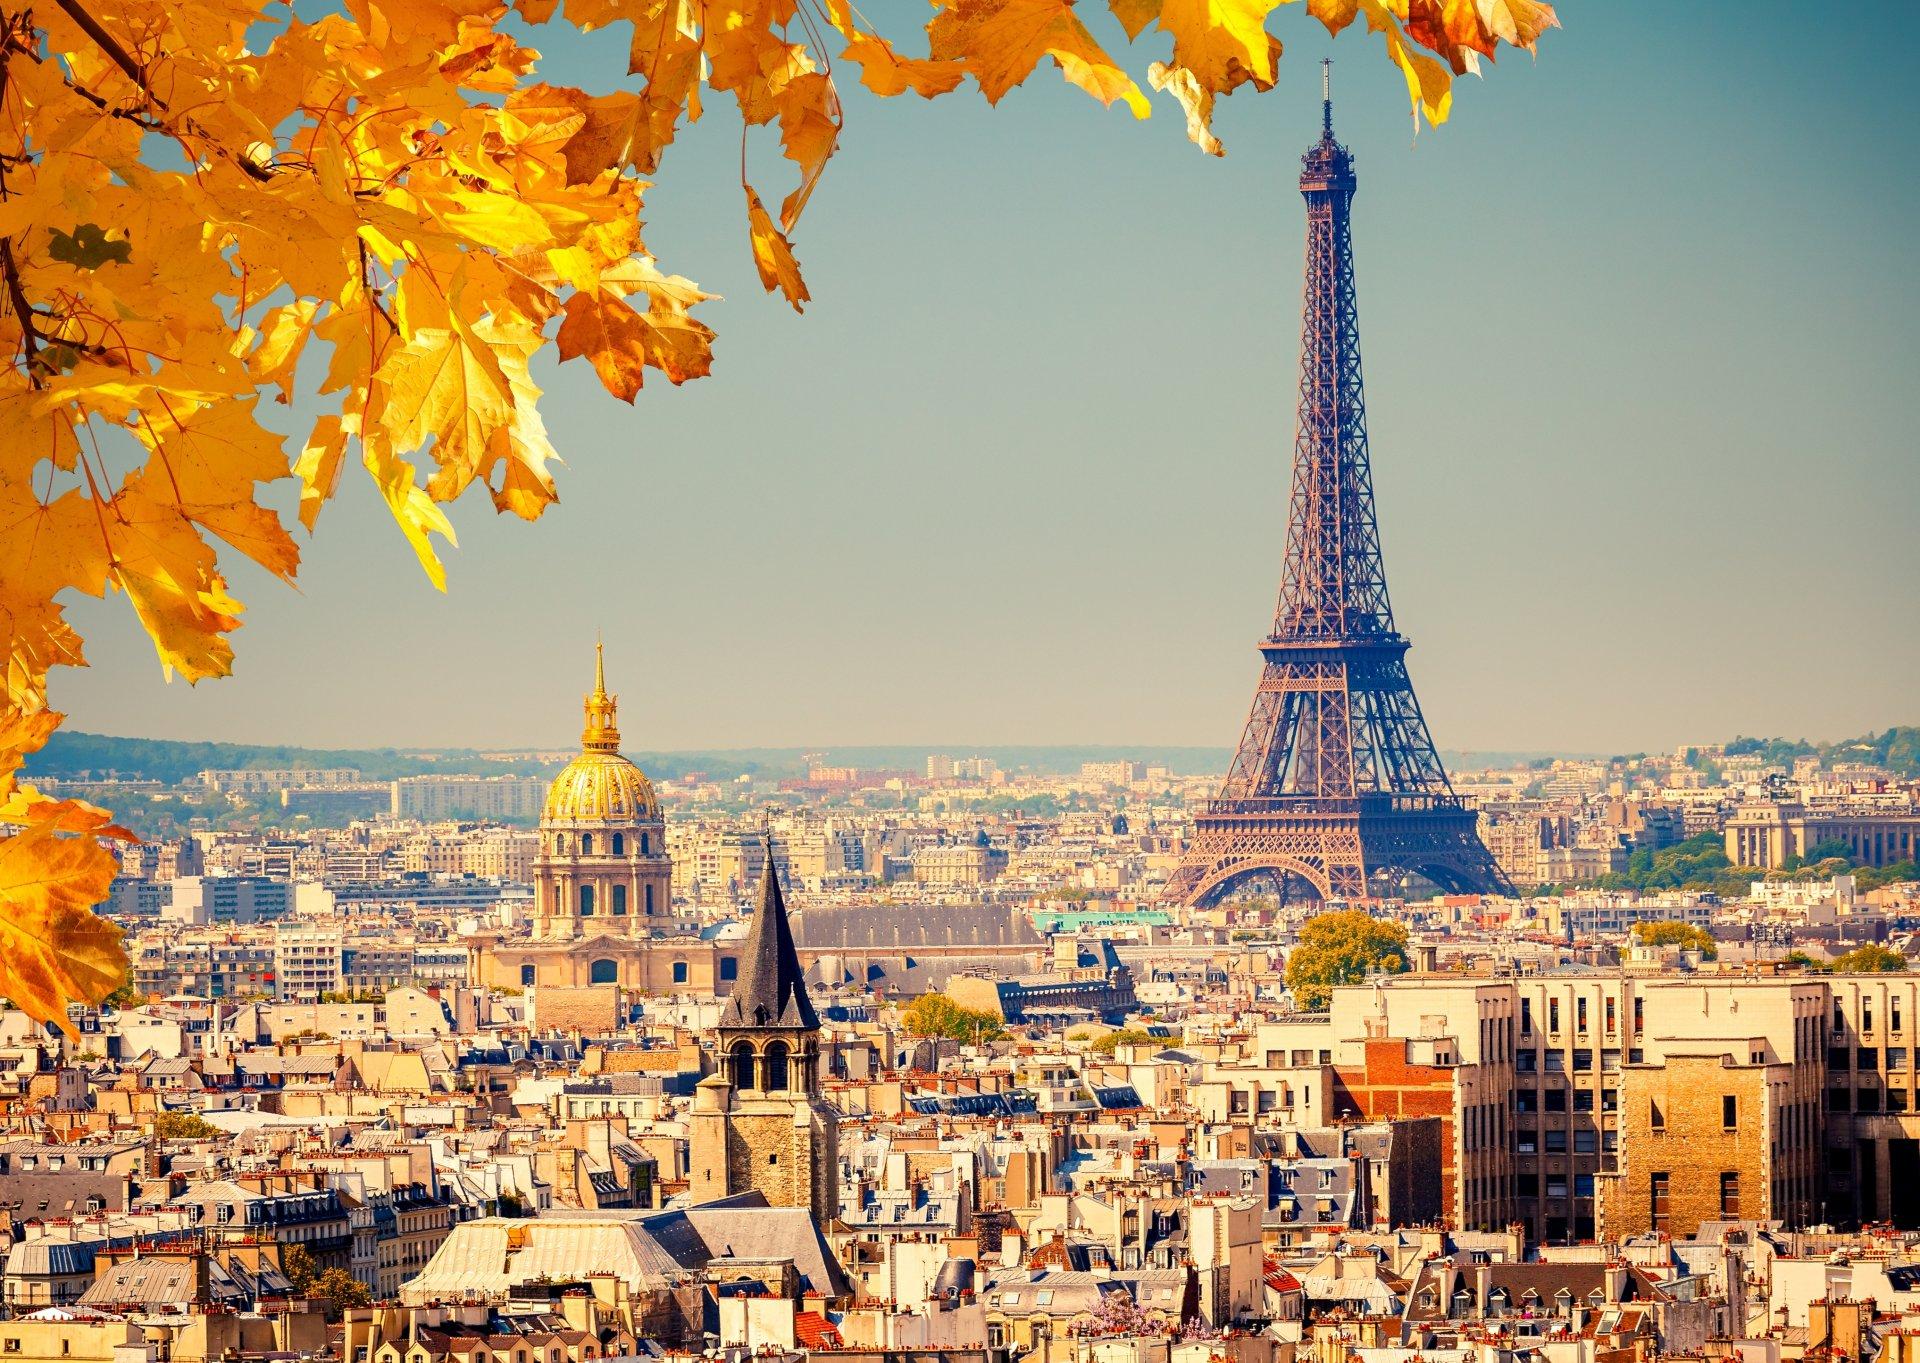 france-paris-la-tour-eiffel-eiffel-tower-franciya-parizh-ejfeleva-bashnya-gorod-panorama-vid-zdaniya-doma-kupola-kryshi-fon-osen-listya-zheltye